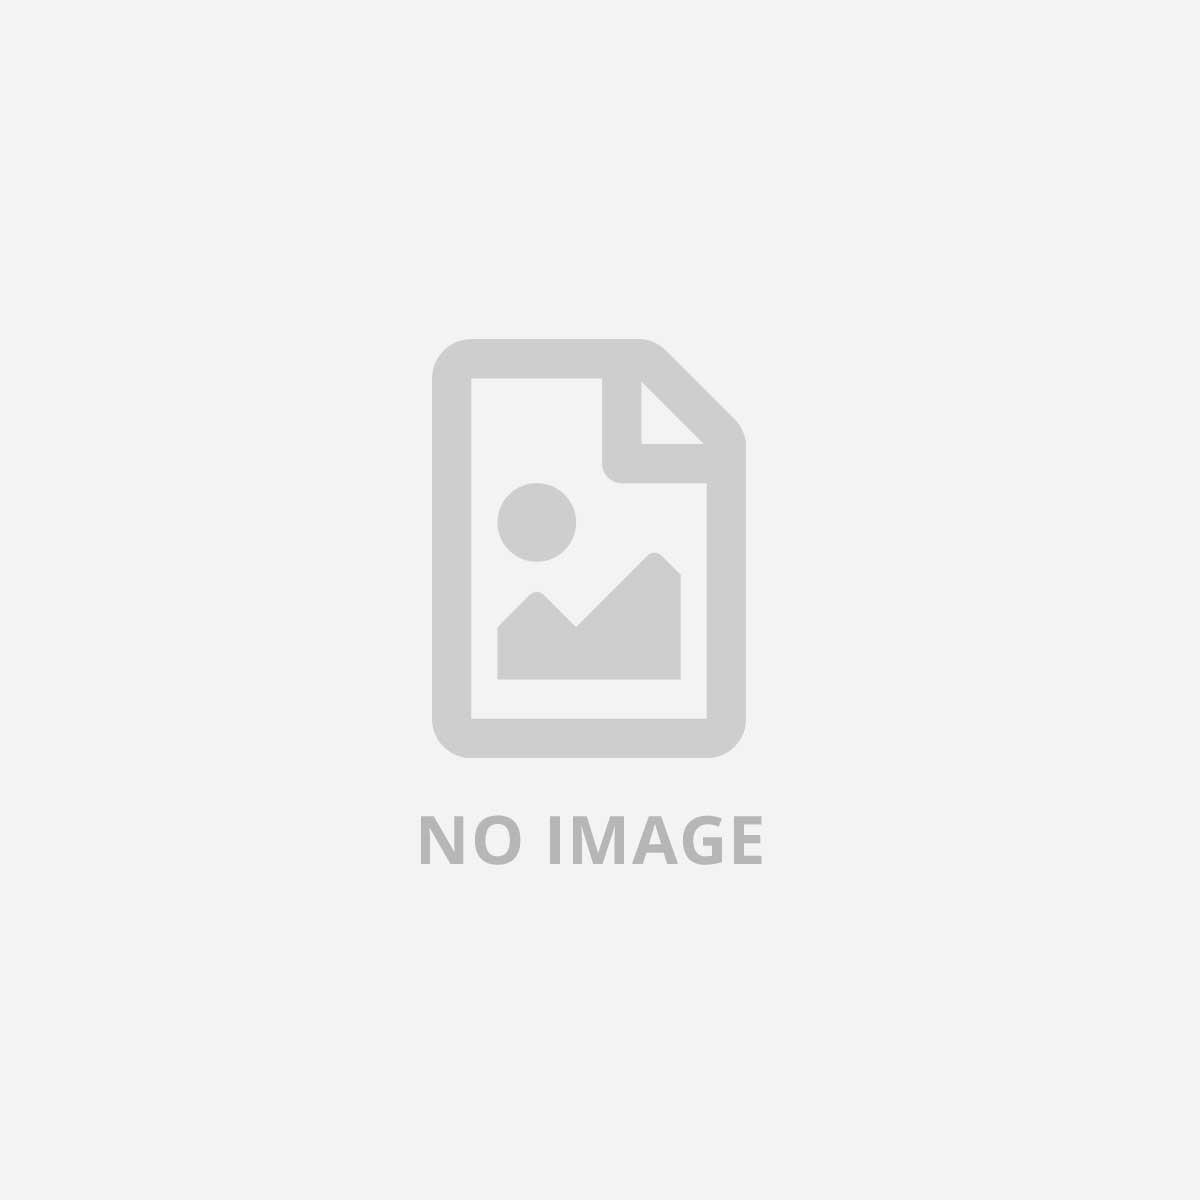 NILOX BATTERIA UPS 12V 7AH